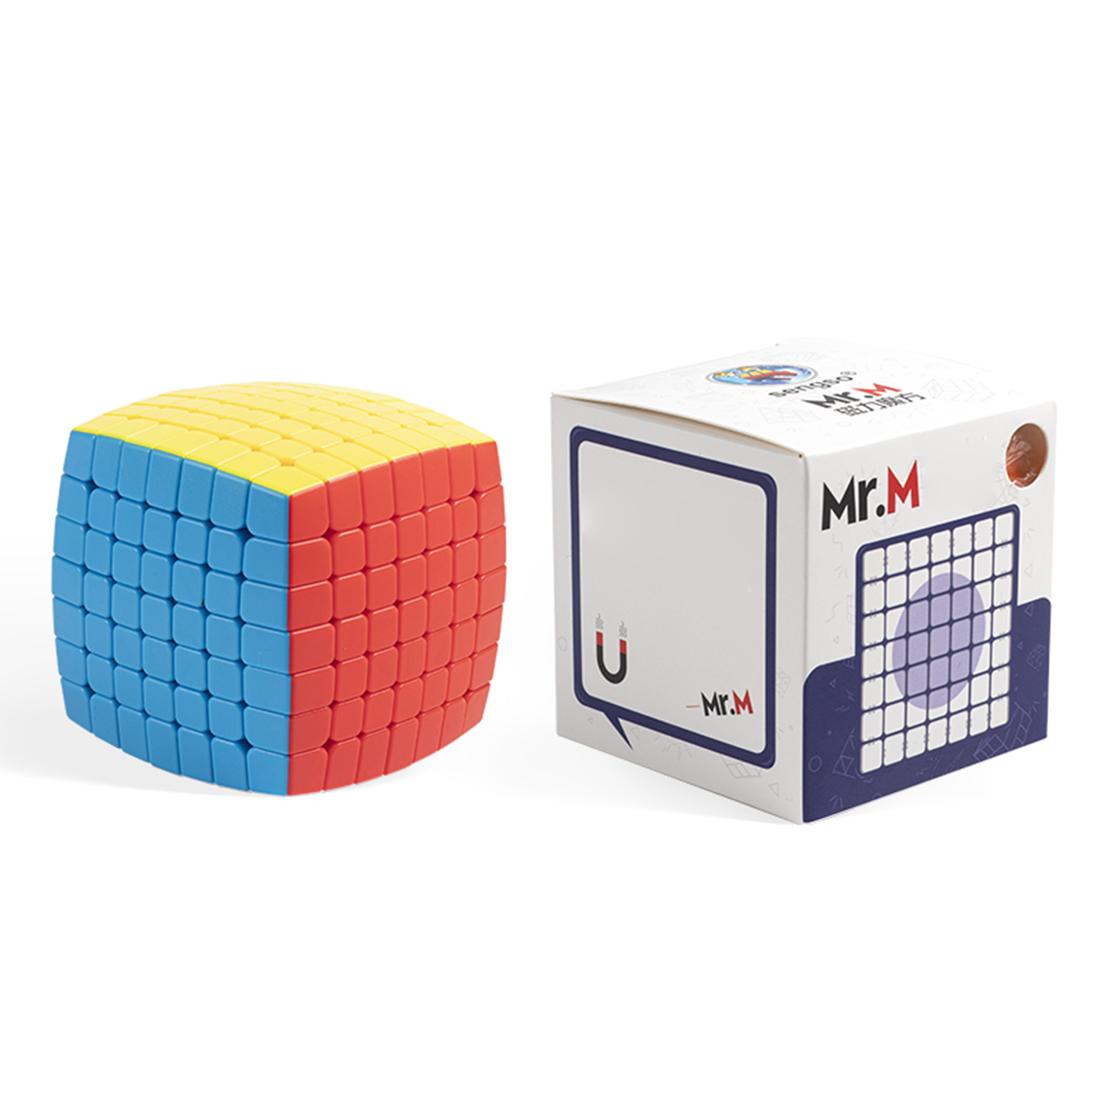 Shengshou mr m magnetic//3 layers magic cube puzzle-stickerless